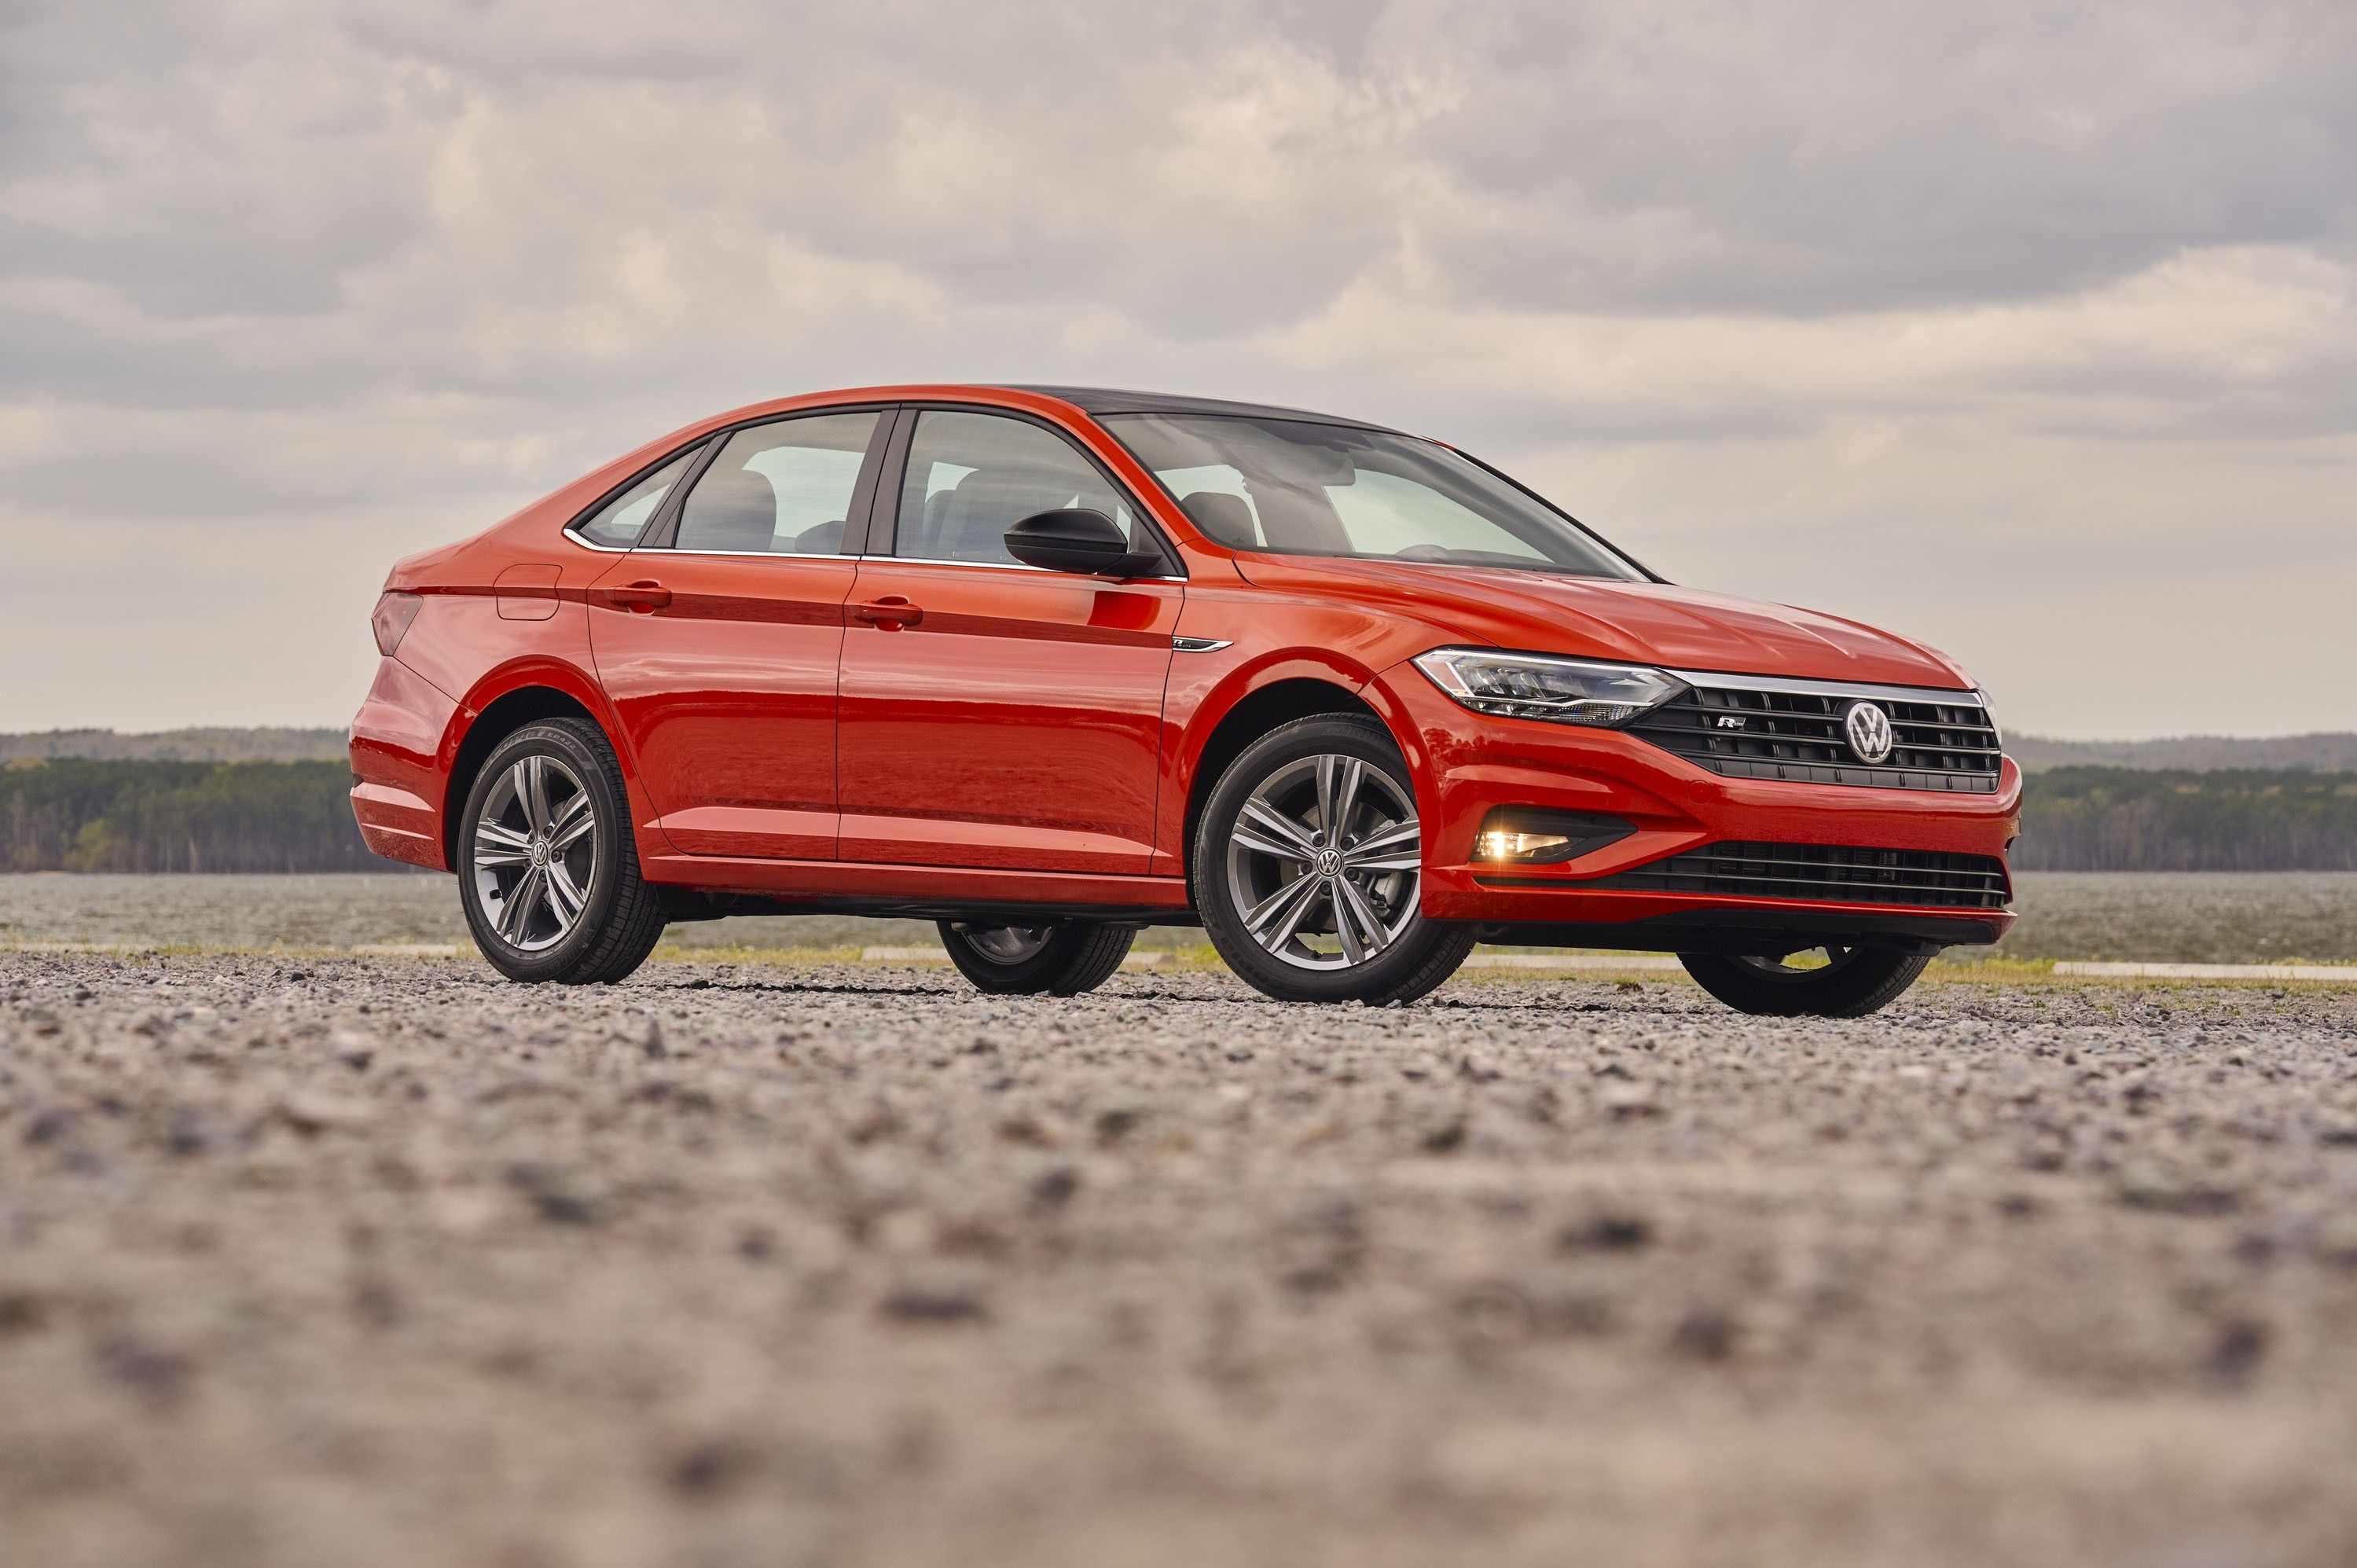 2019 Jetta Hybrid Specs And Review Volkswagen Jetta Volkswagen Vw Jetta Tdi